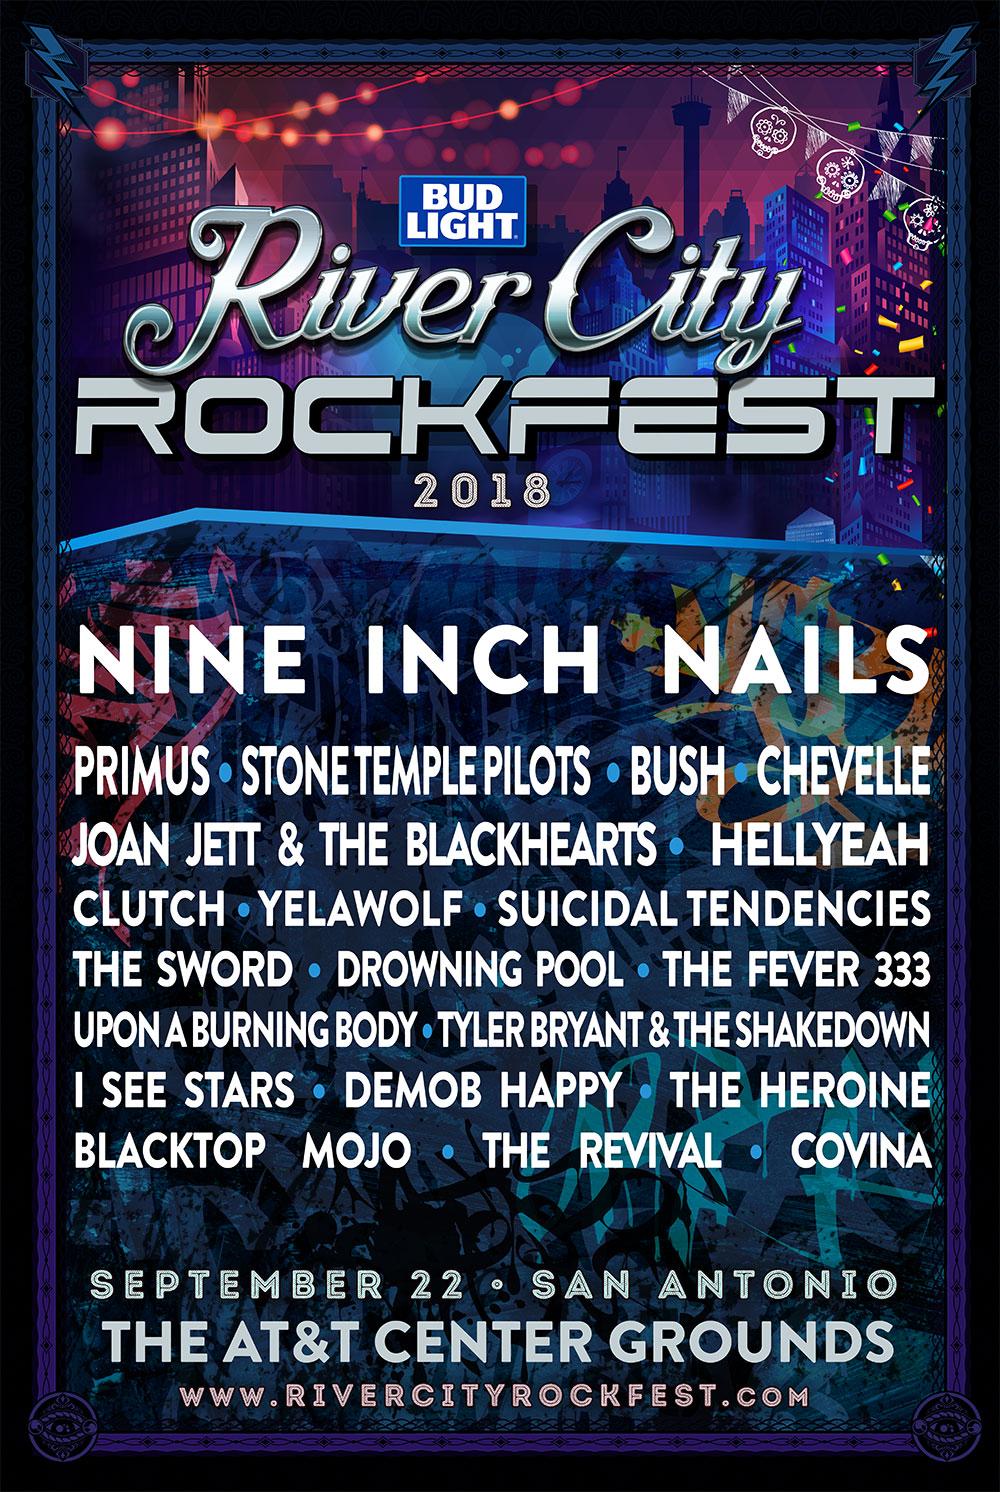 rockfest 20181 Nine Inch Nails to headline San Antonios River City Rockfest in 2018